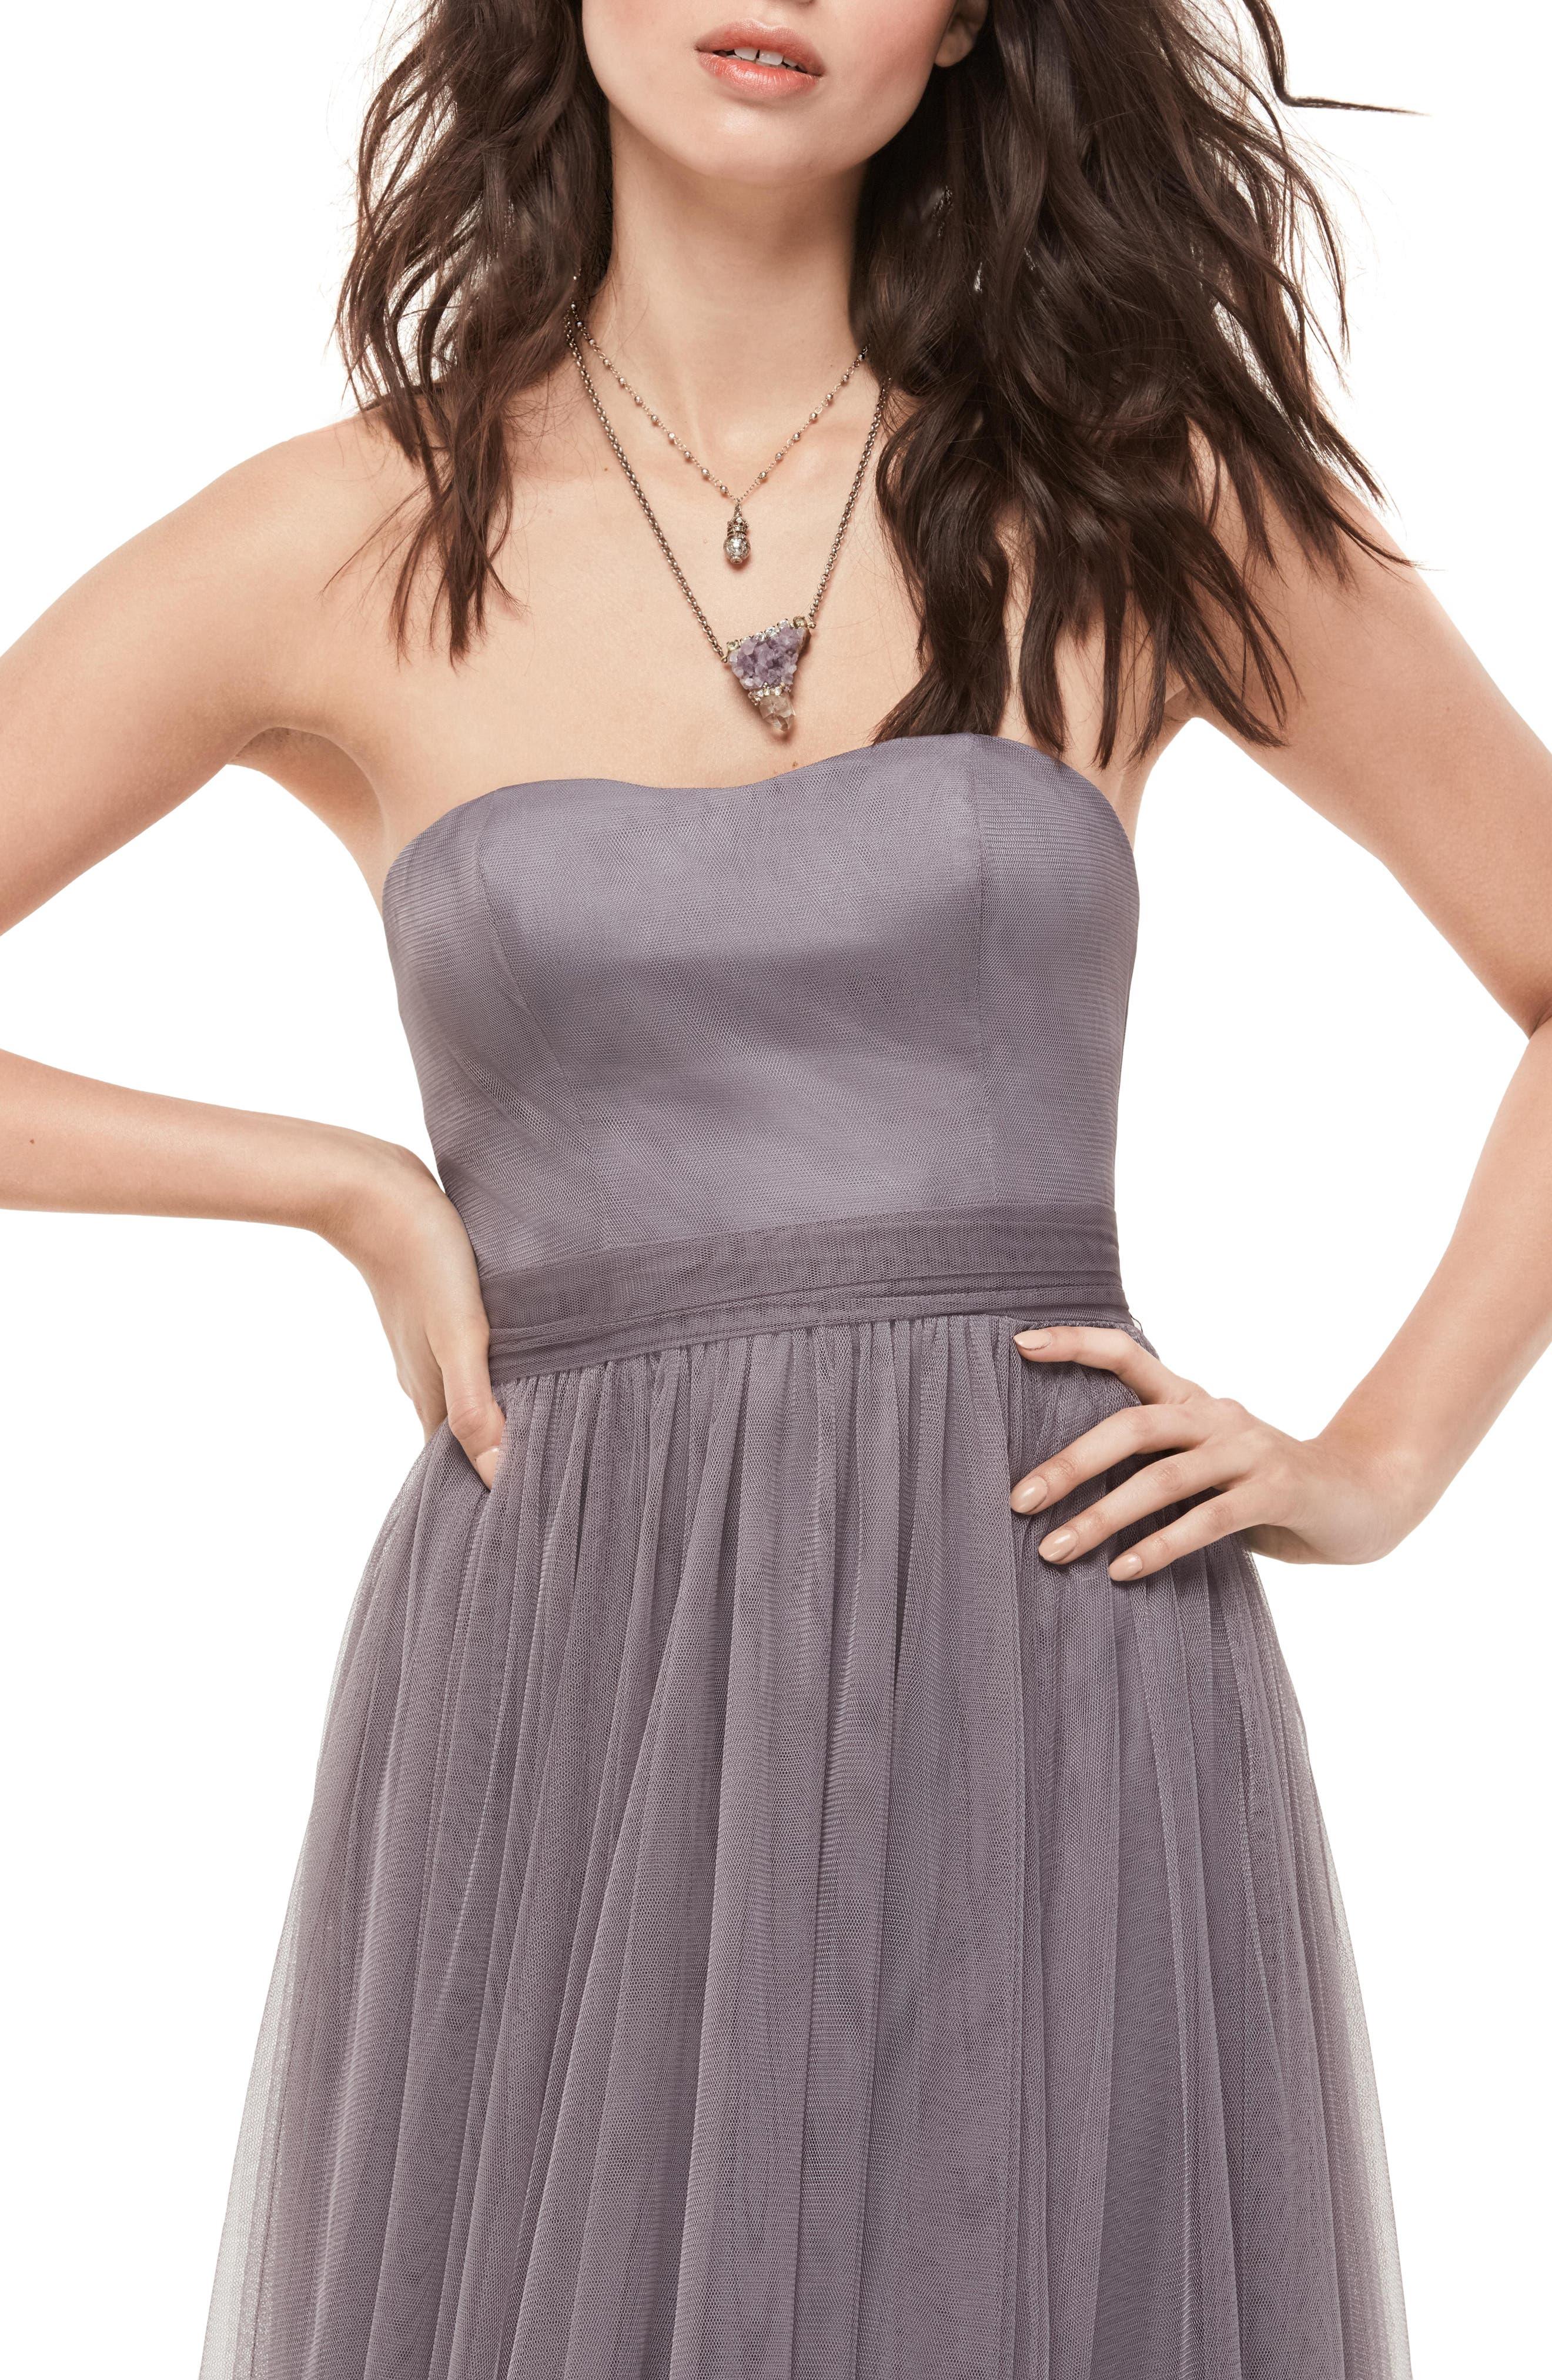 Bobbinet Strapless Gown,                             Alternate thumbnail 3, color,                             030